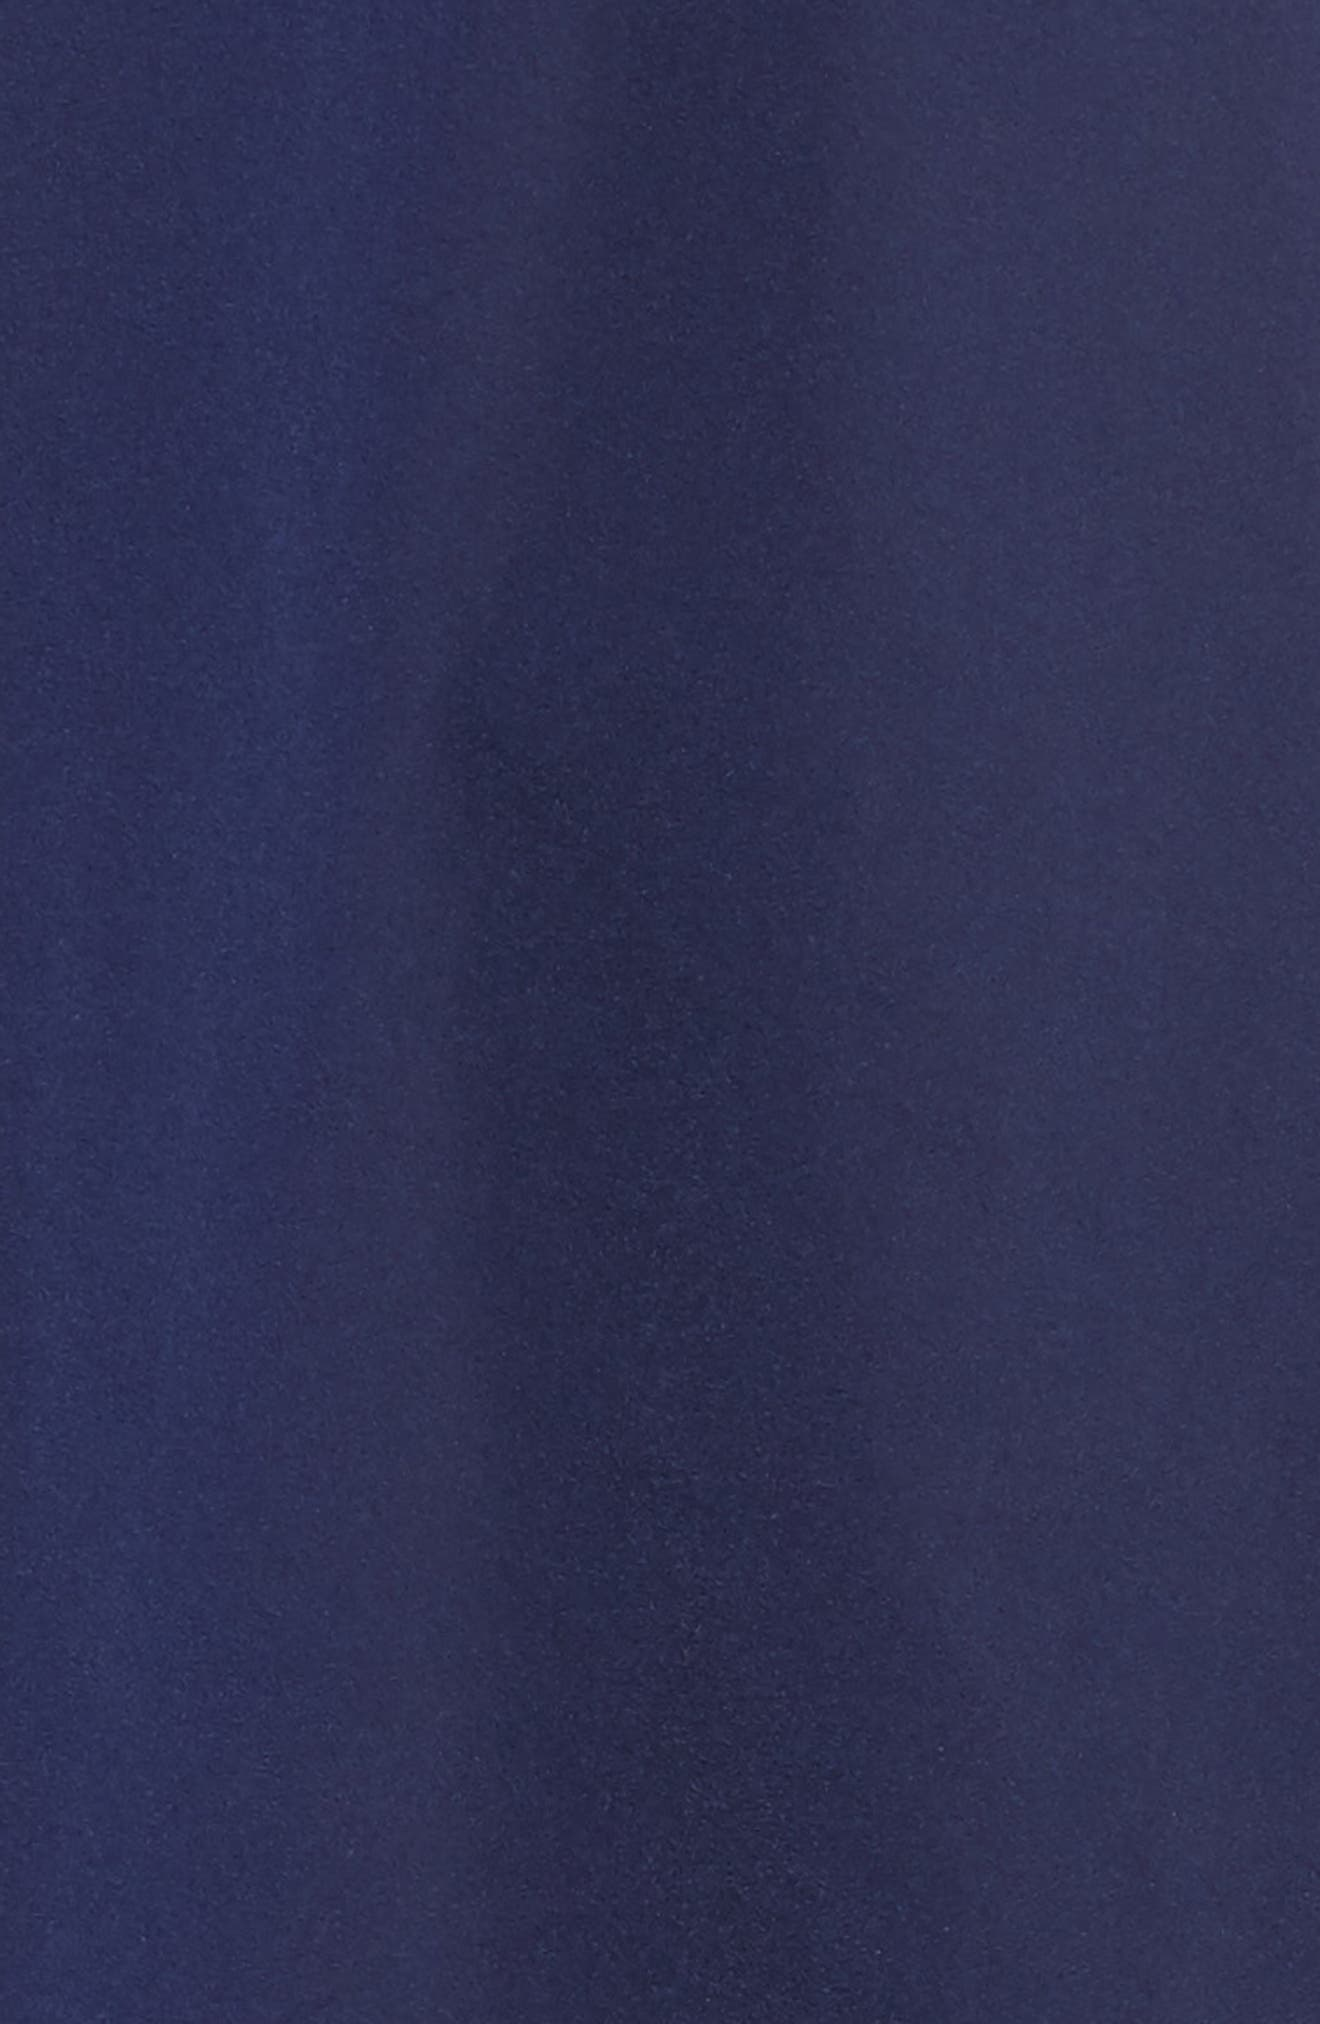 Ruched Sleeve Taffeta Dress,                             Alternate thumbnail 5, color,                             404